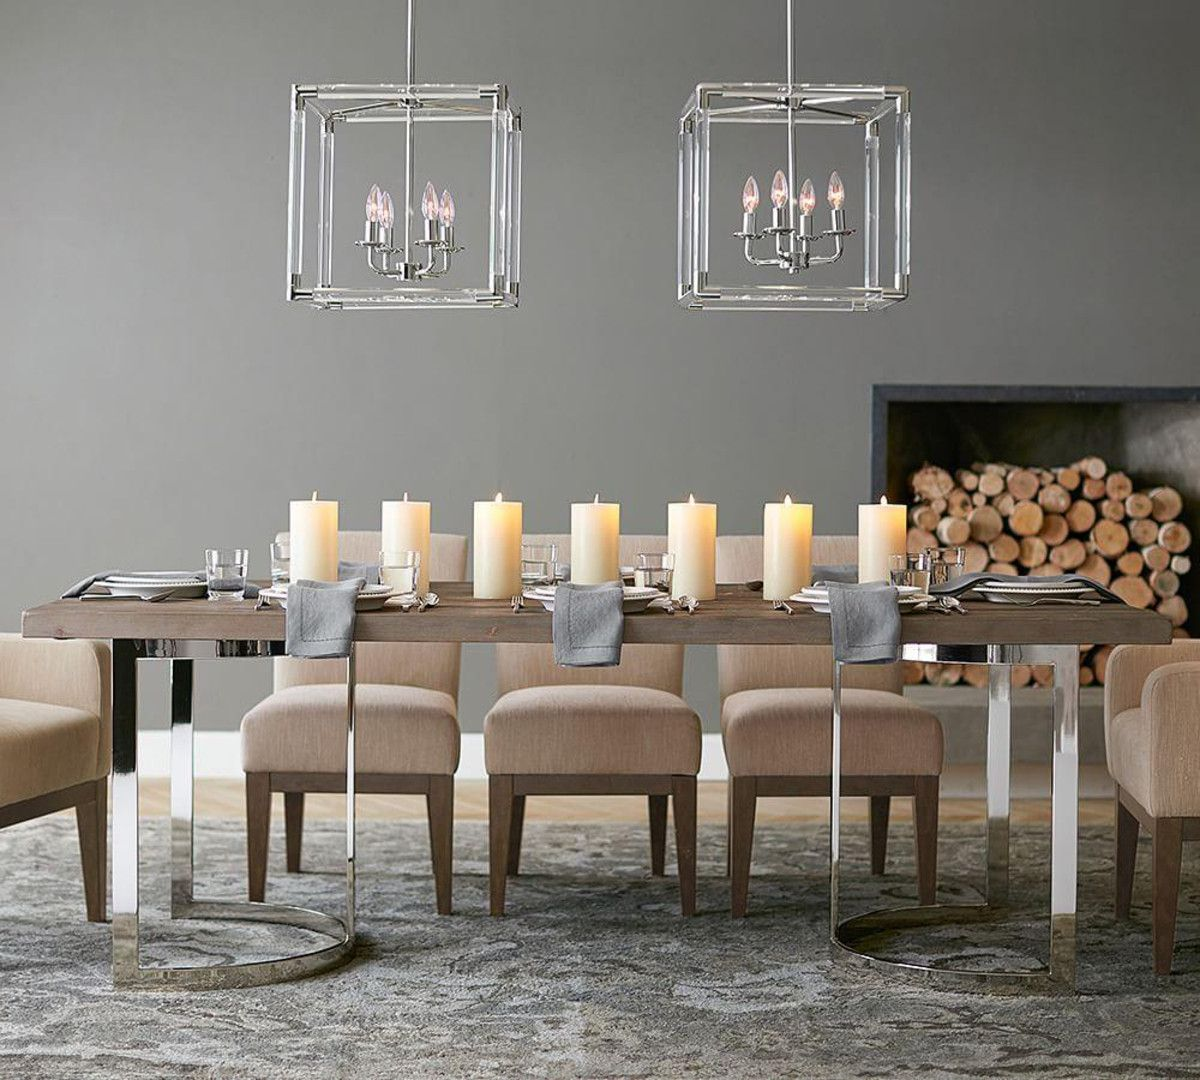 Pottery barn rectangular dining table - Durham Reclaimed Wood Fixed Dining Table Pottery Barn Au